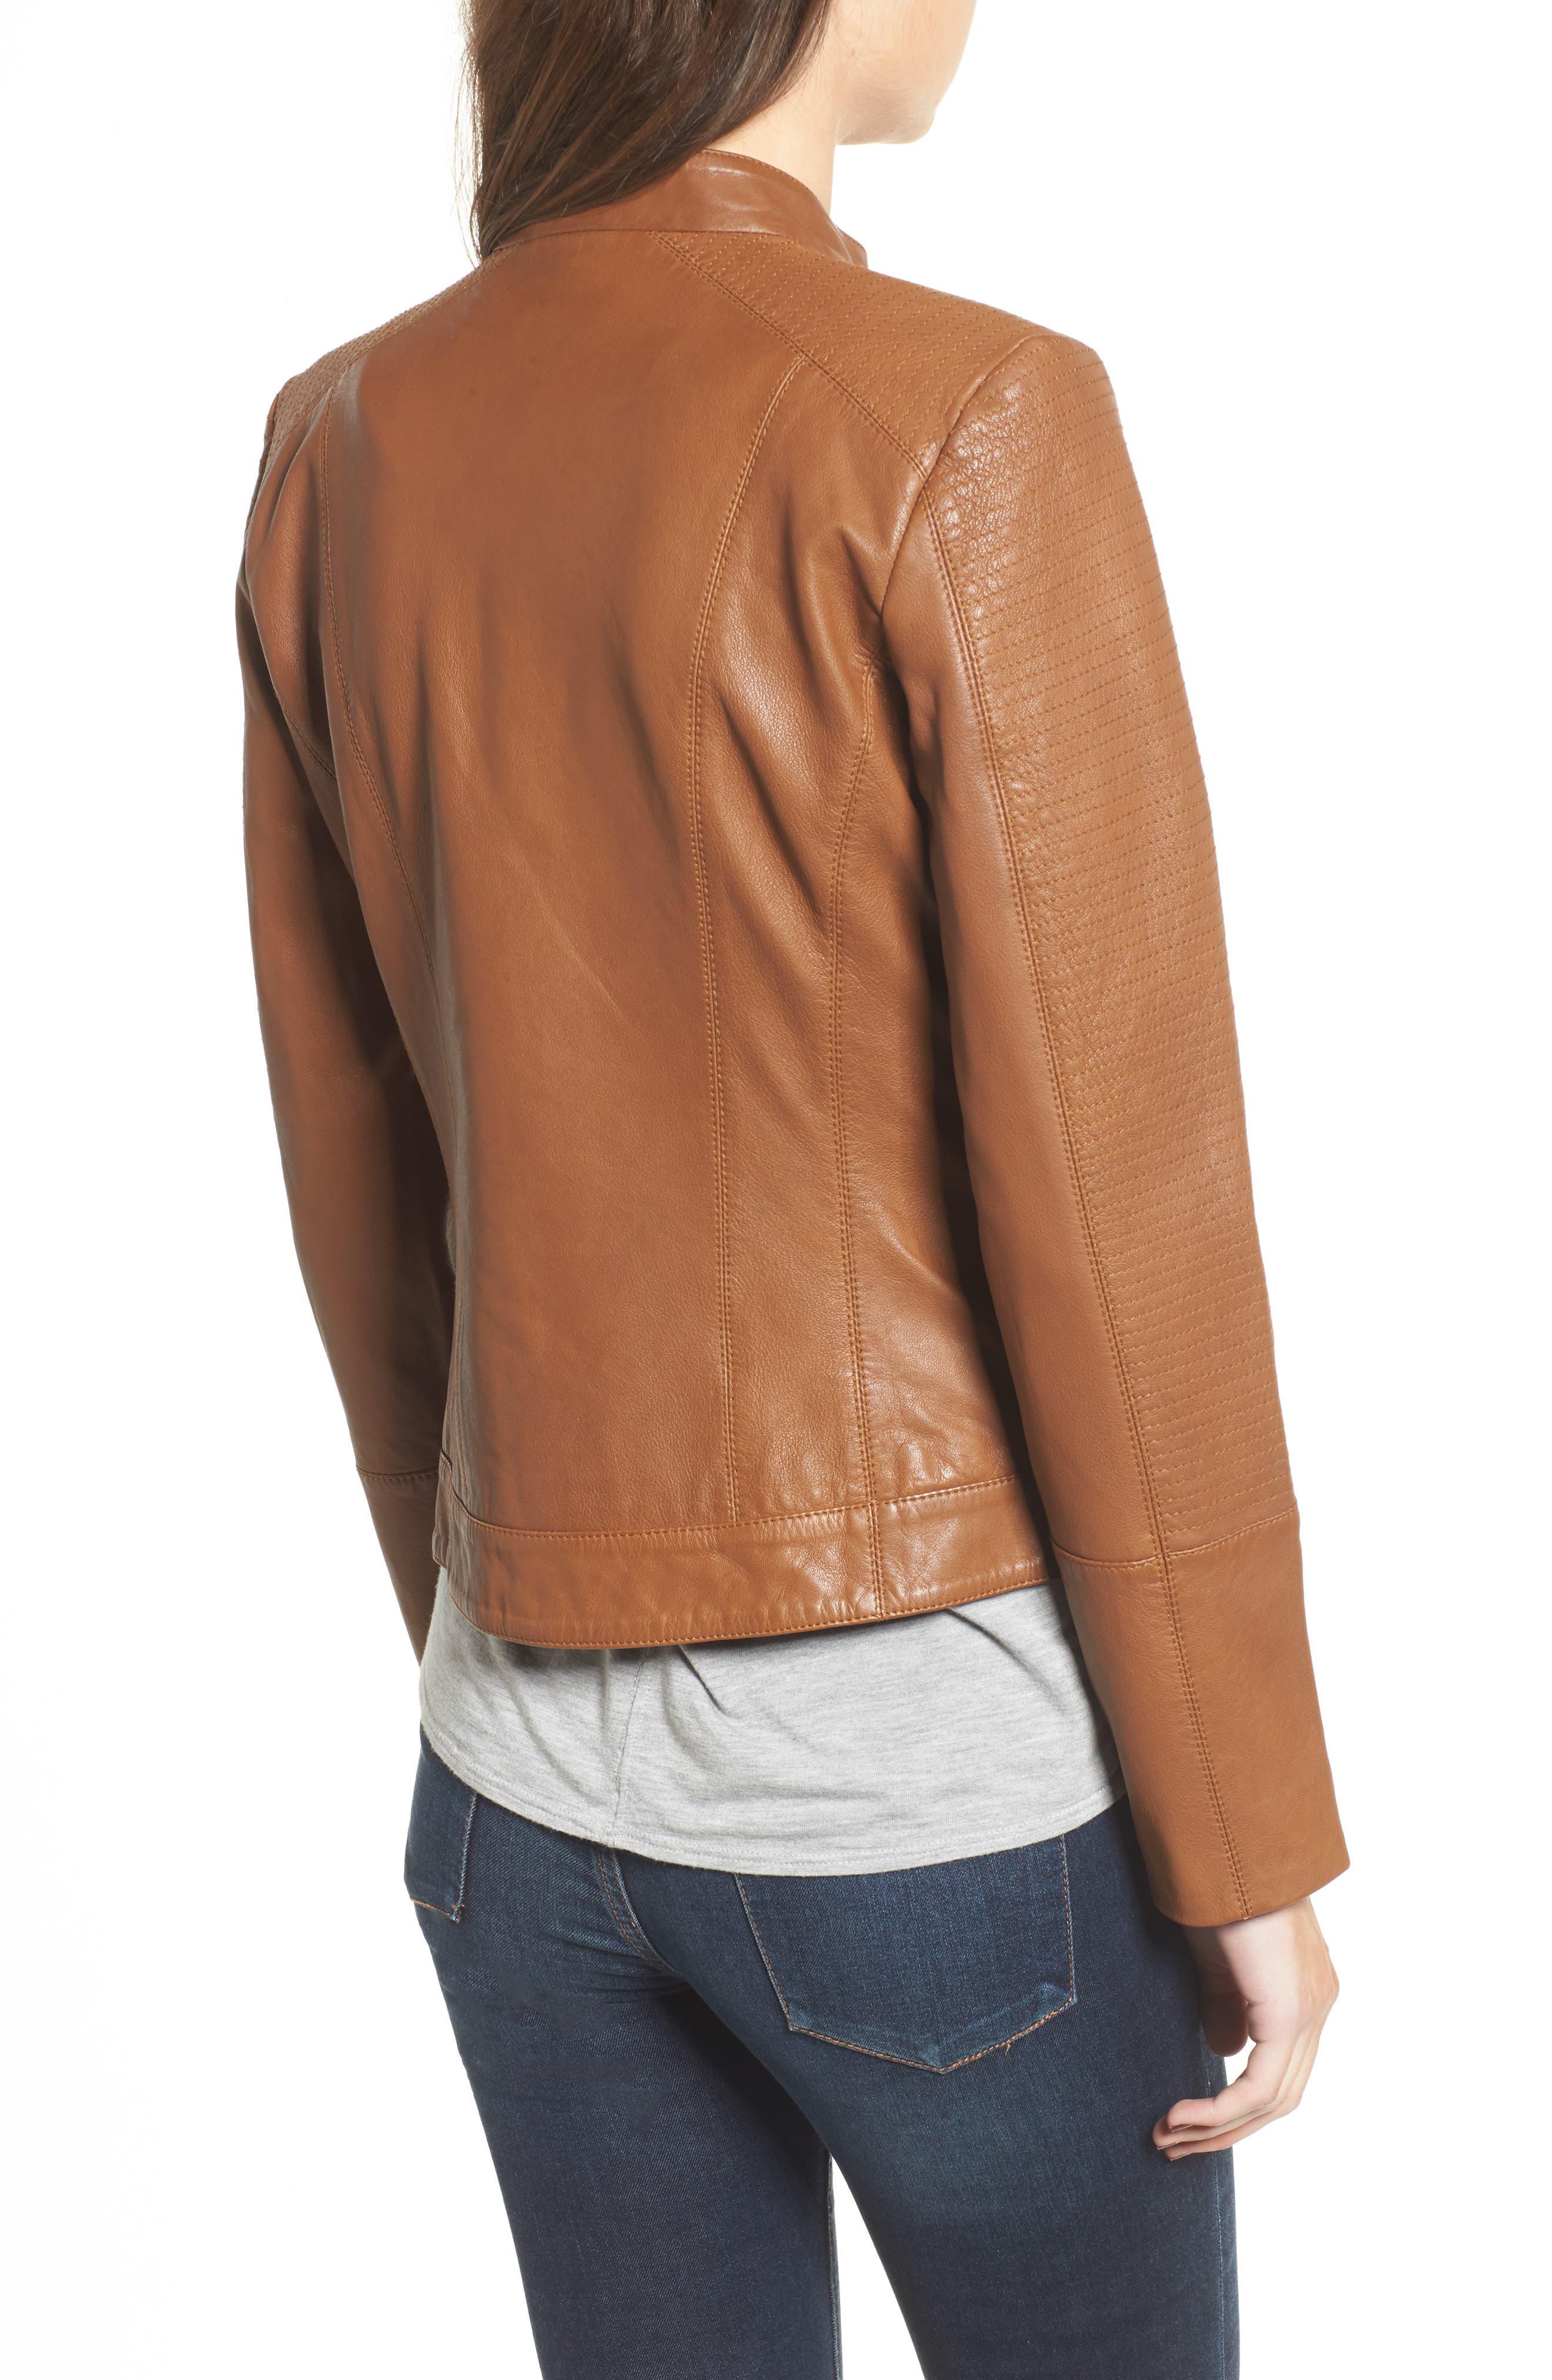 Kirwin Leather Moto Jacket,                             Alternate thumbnail 2, color,                             Pecan